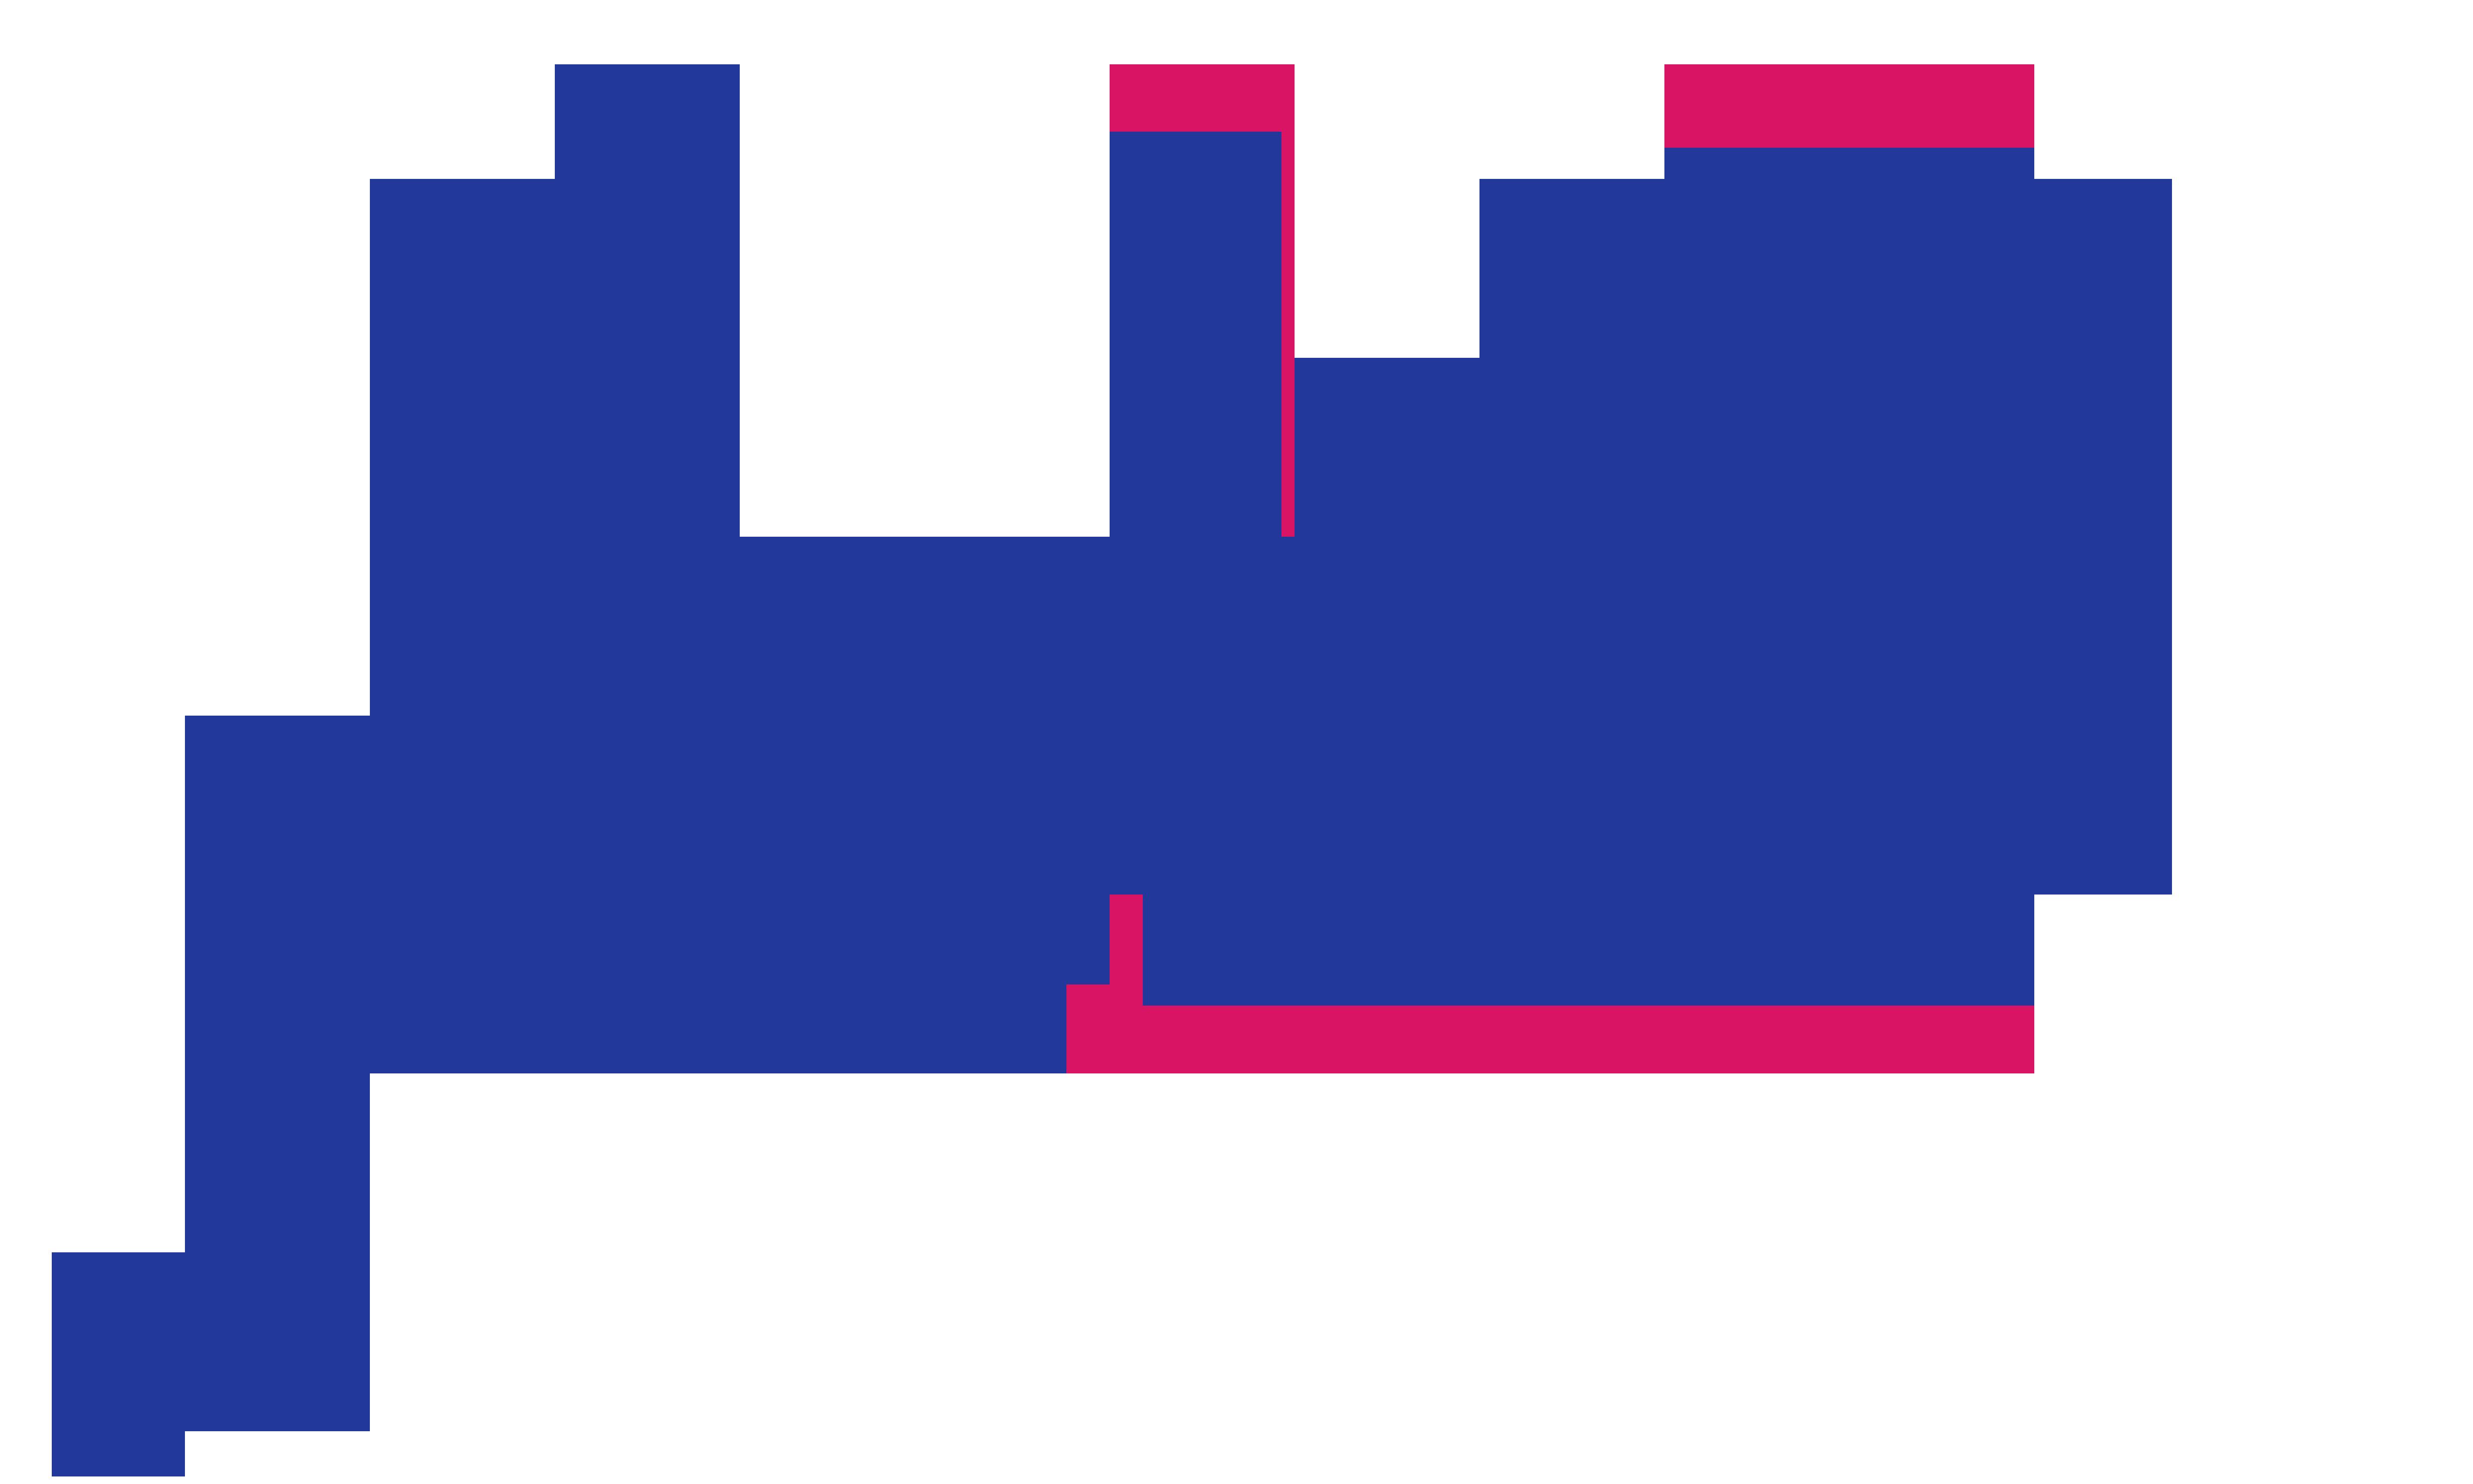 vector melanie copia blau